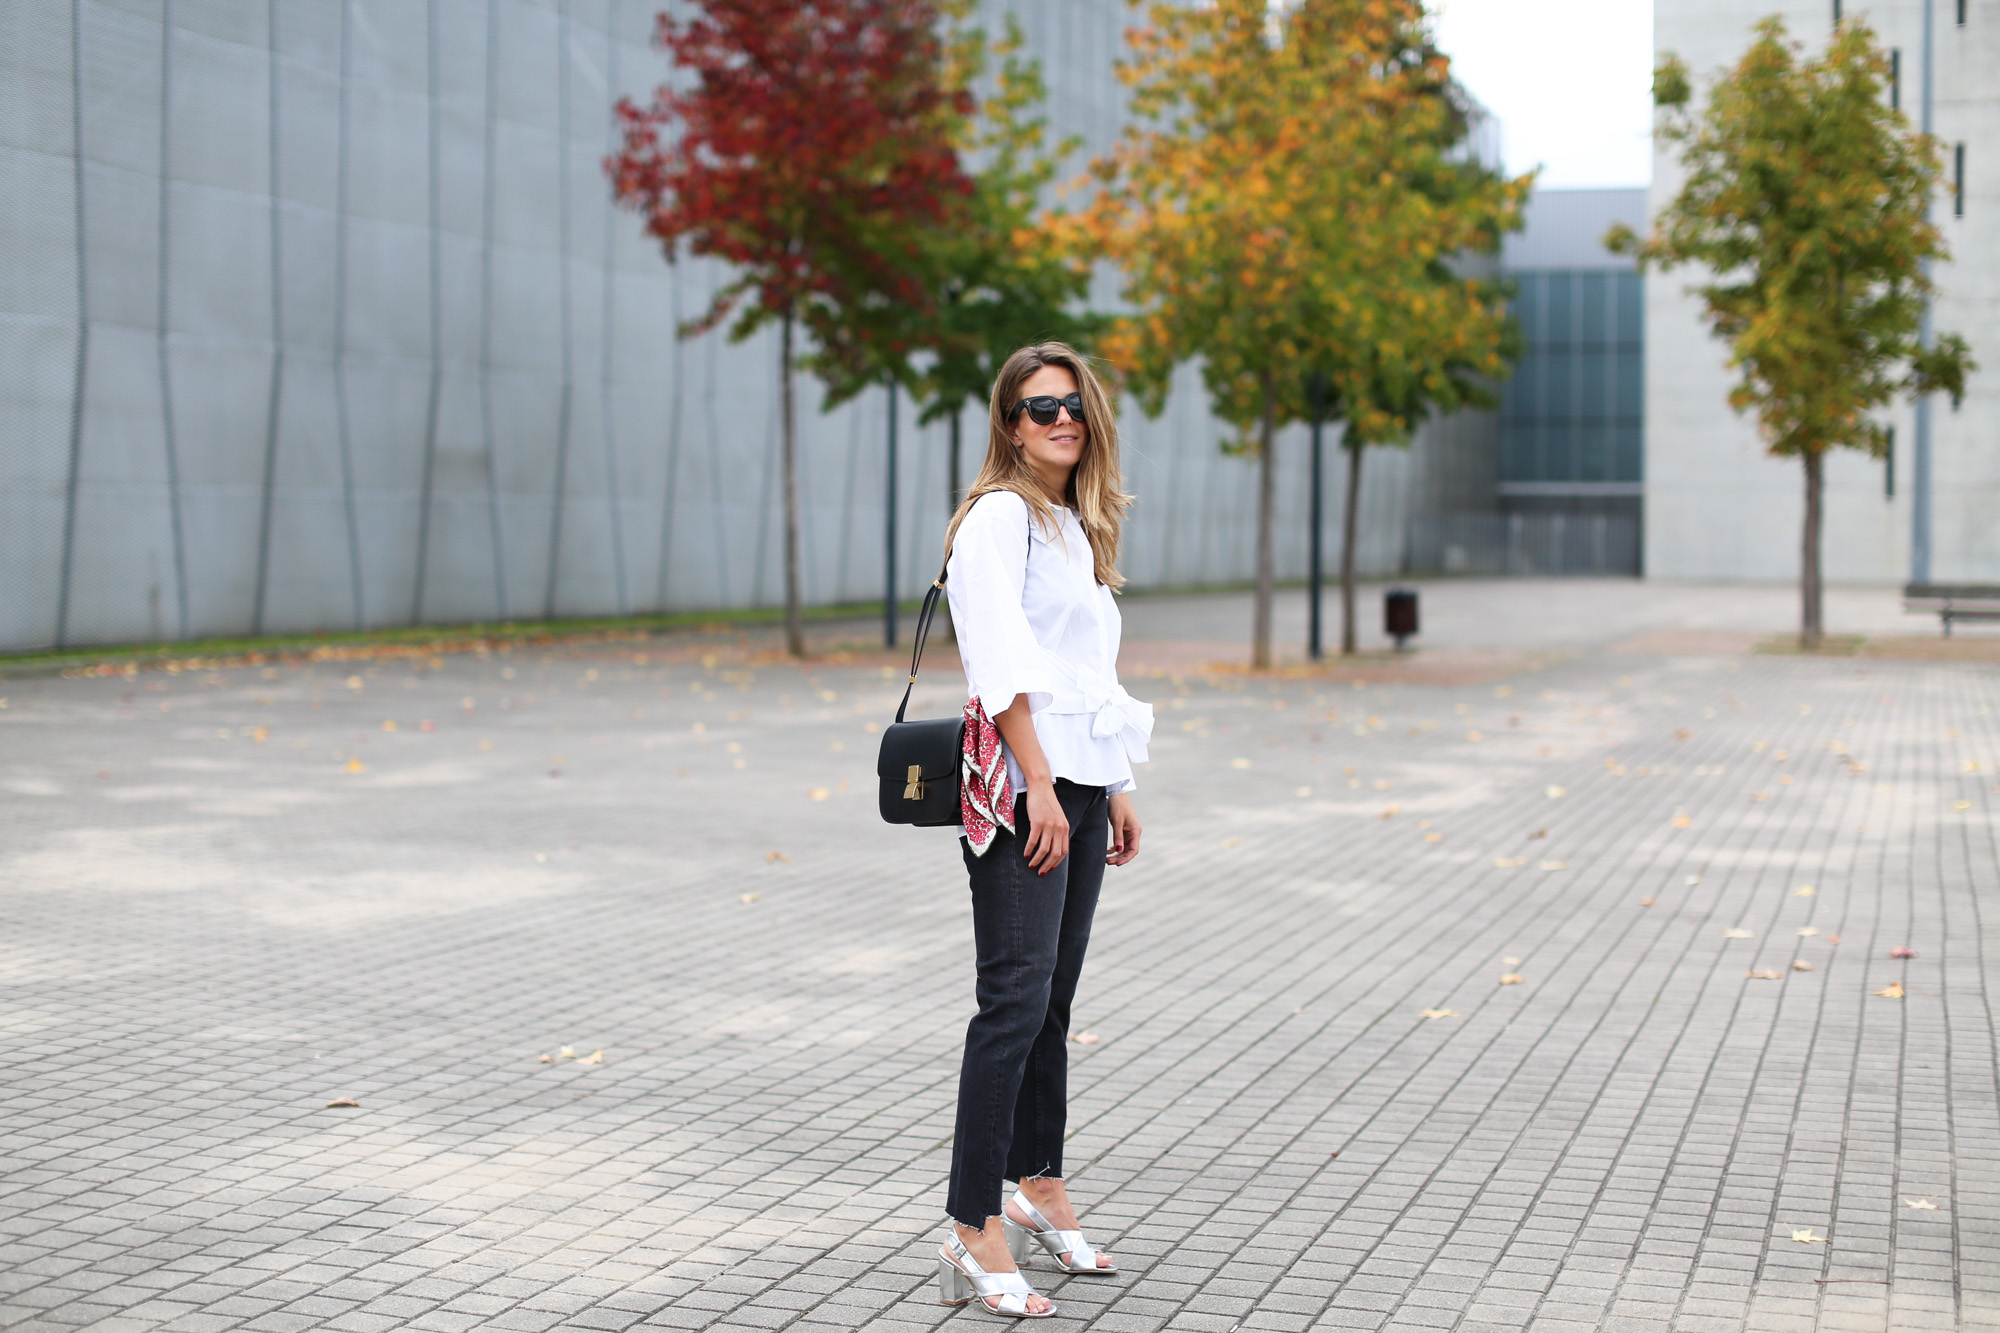 clochet_streetstyle_fashionblogger_celineboxbag_momjeans_celineparissunglasses_purificaciongarciapañueloseda-3